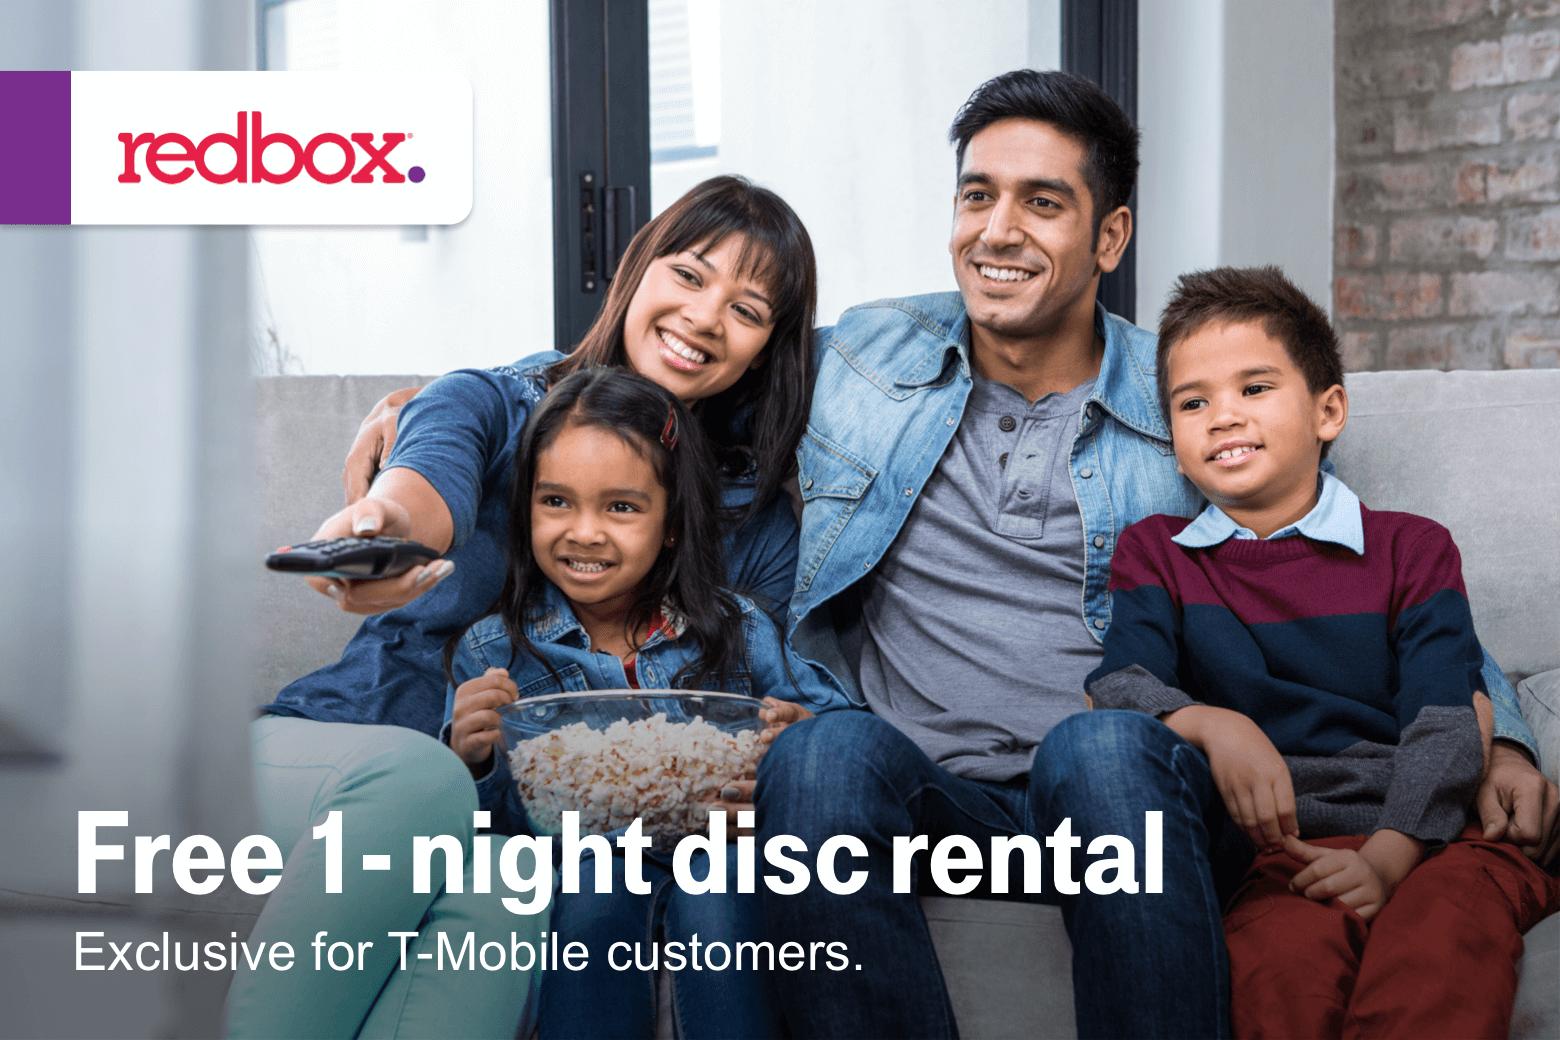 T-Mobile Customers 04/23: Free Redbox, $5 off ebay. '47 brand $20 off sports gear